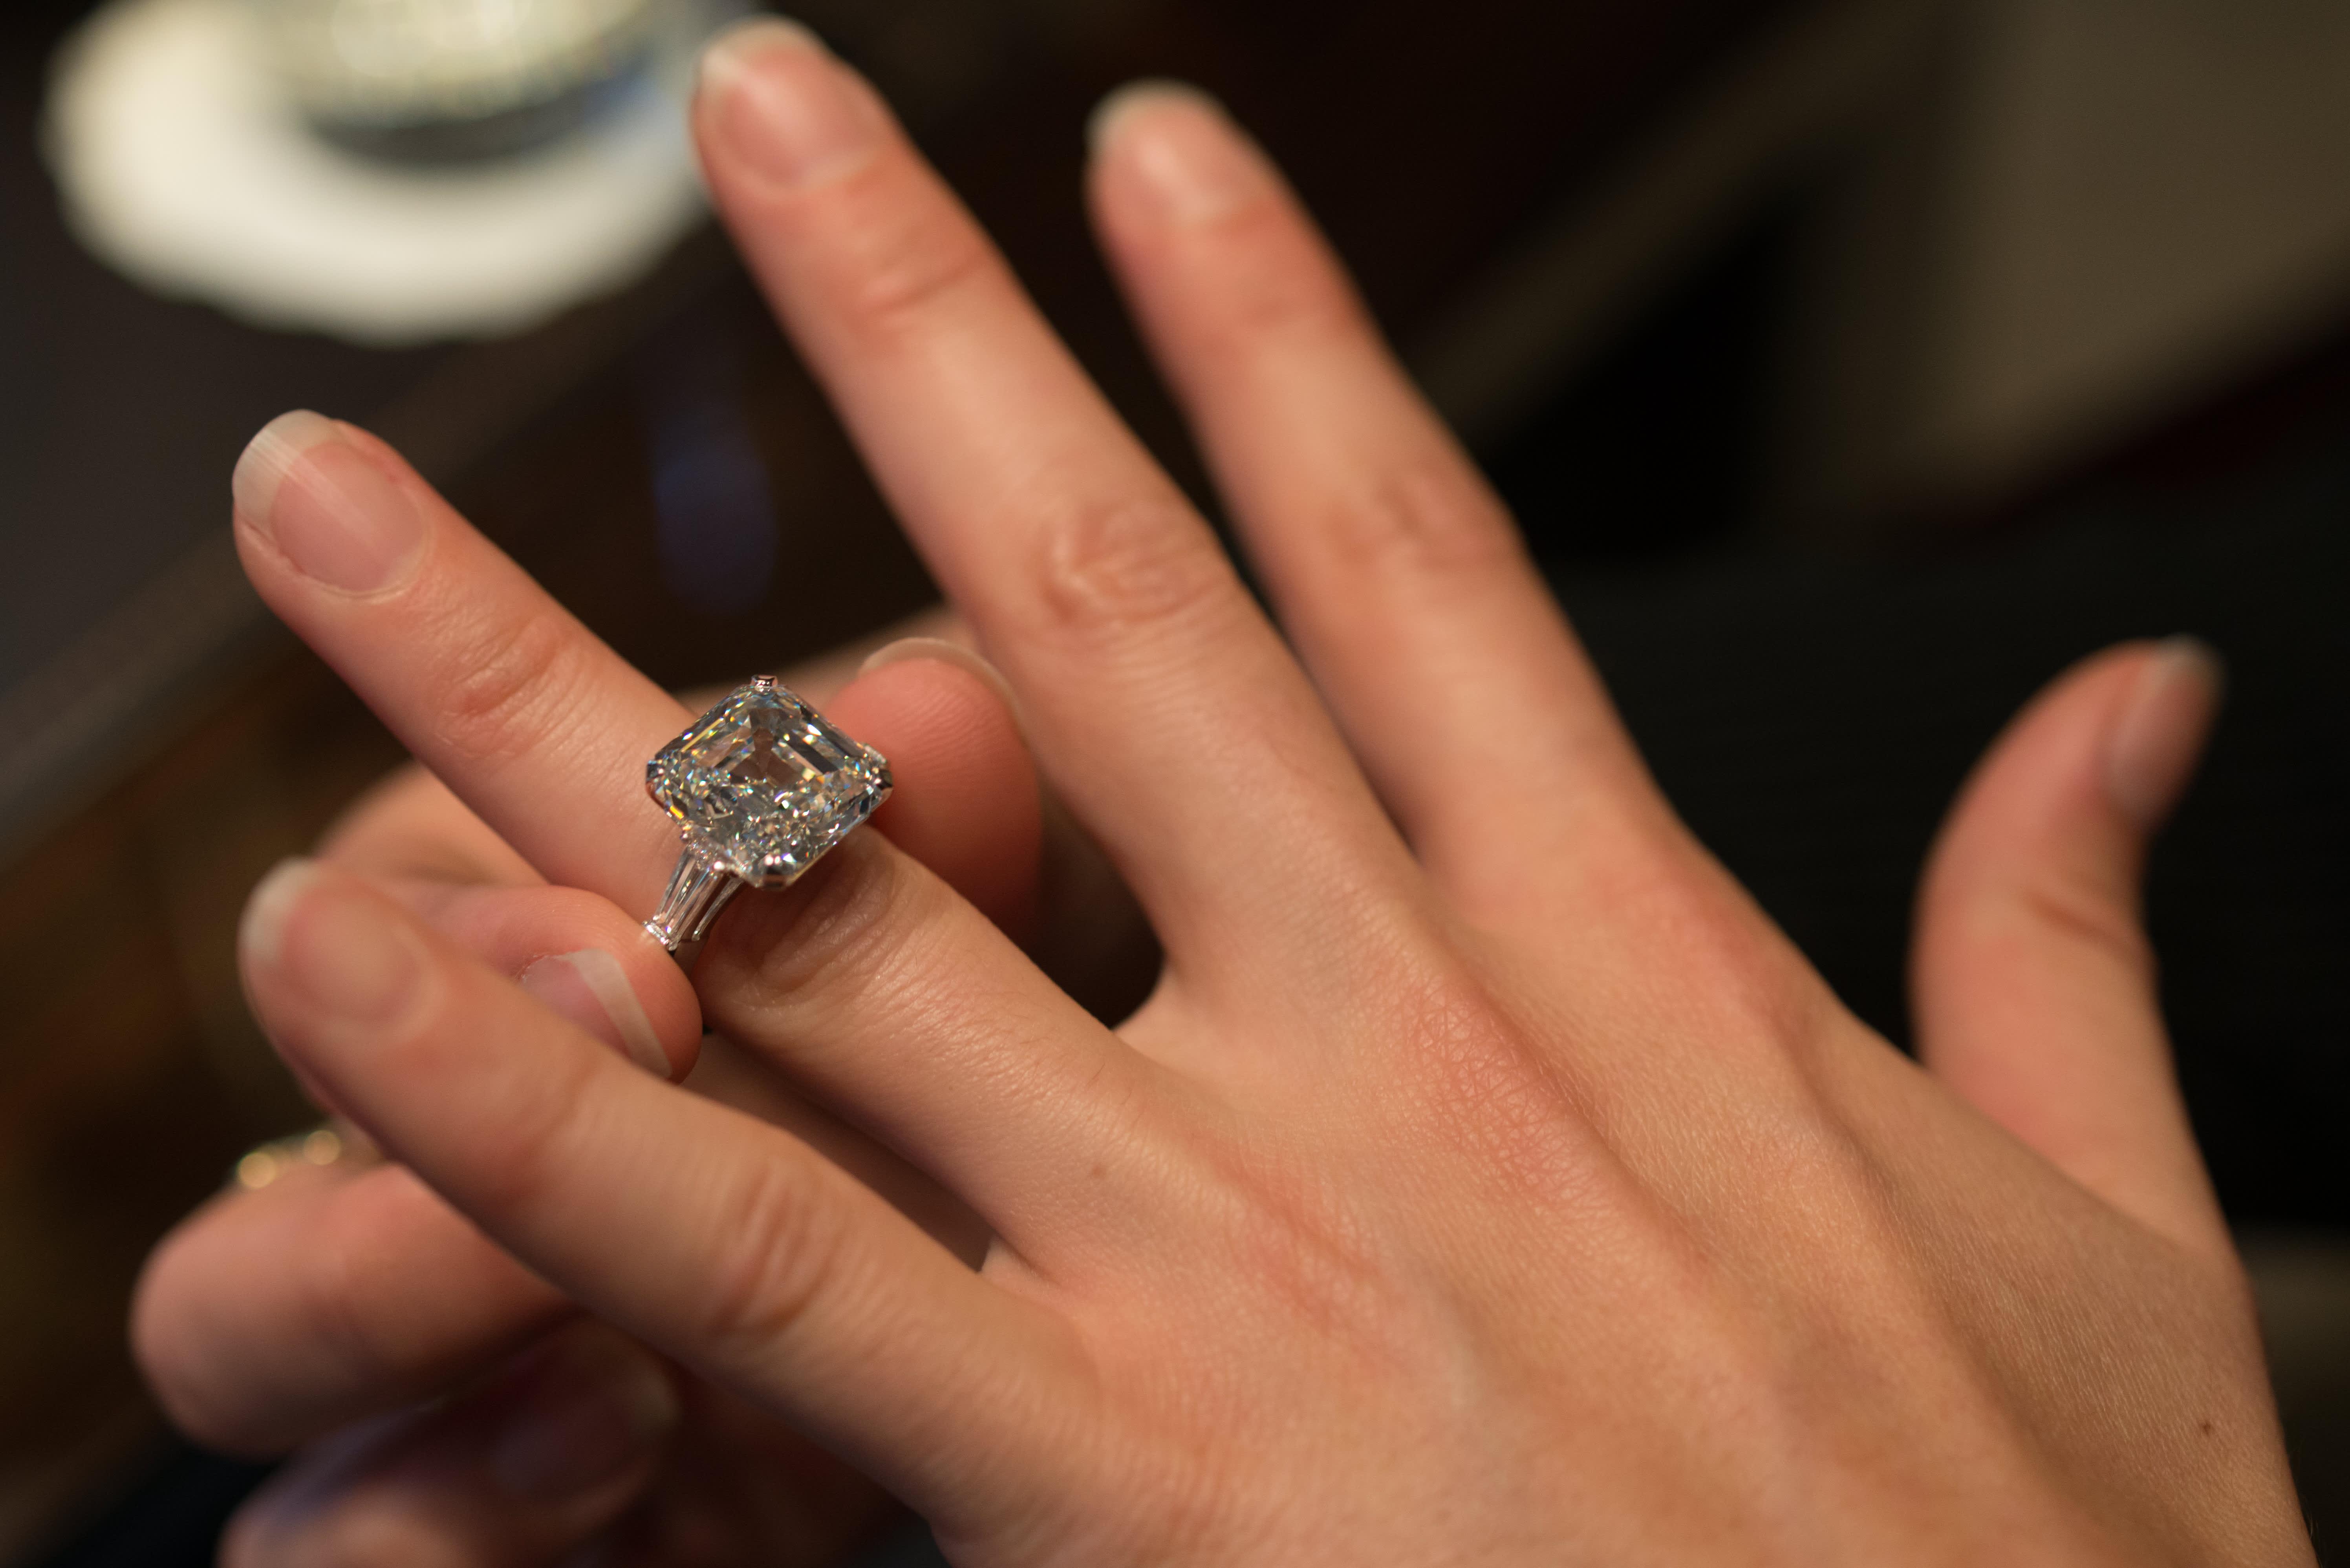 Blame millennials Diamond jewelry business in a rough spot